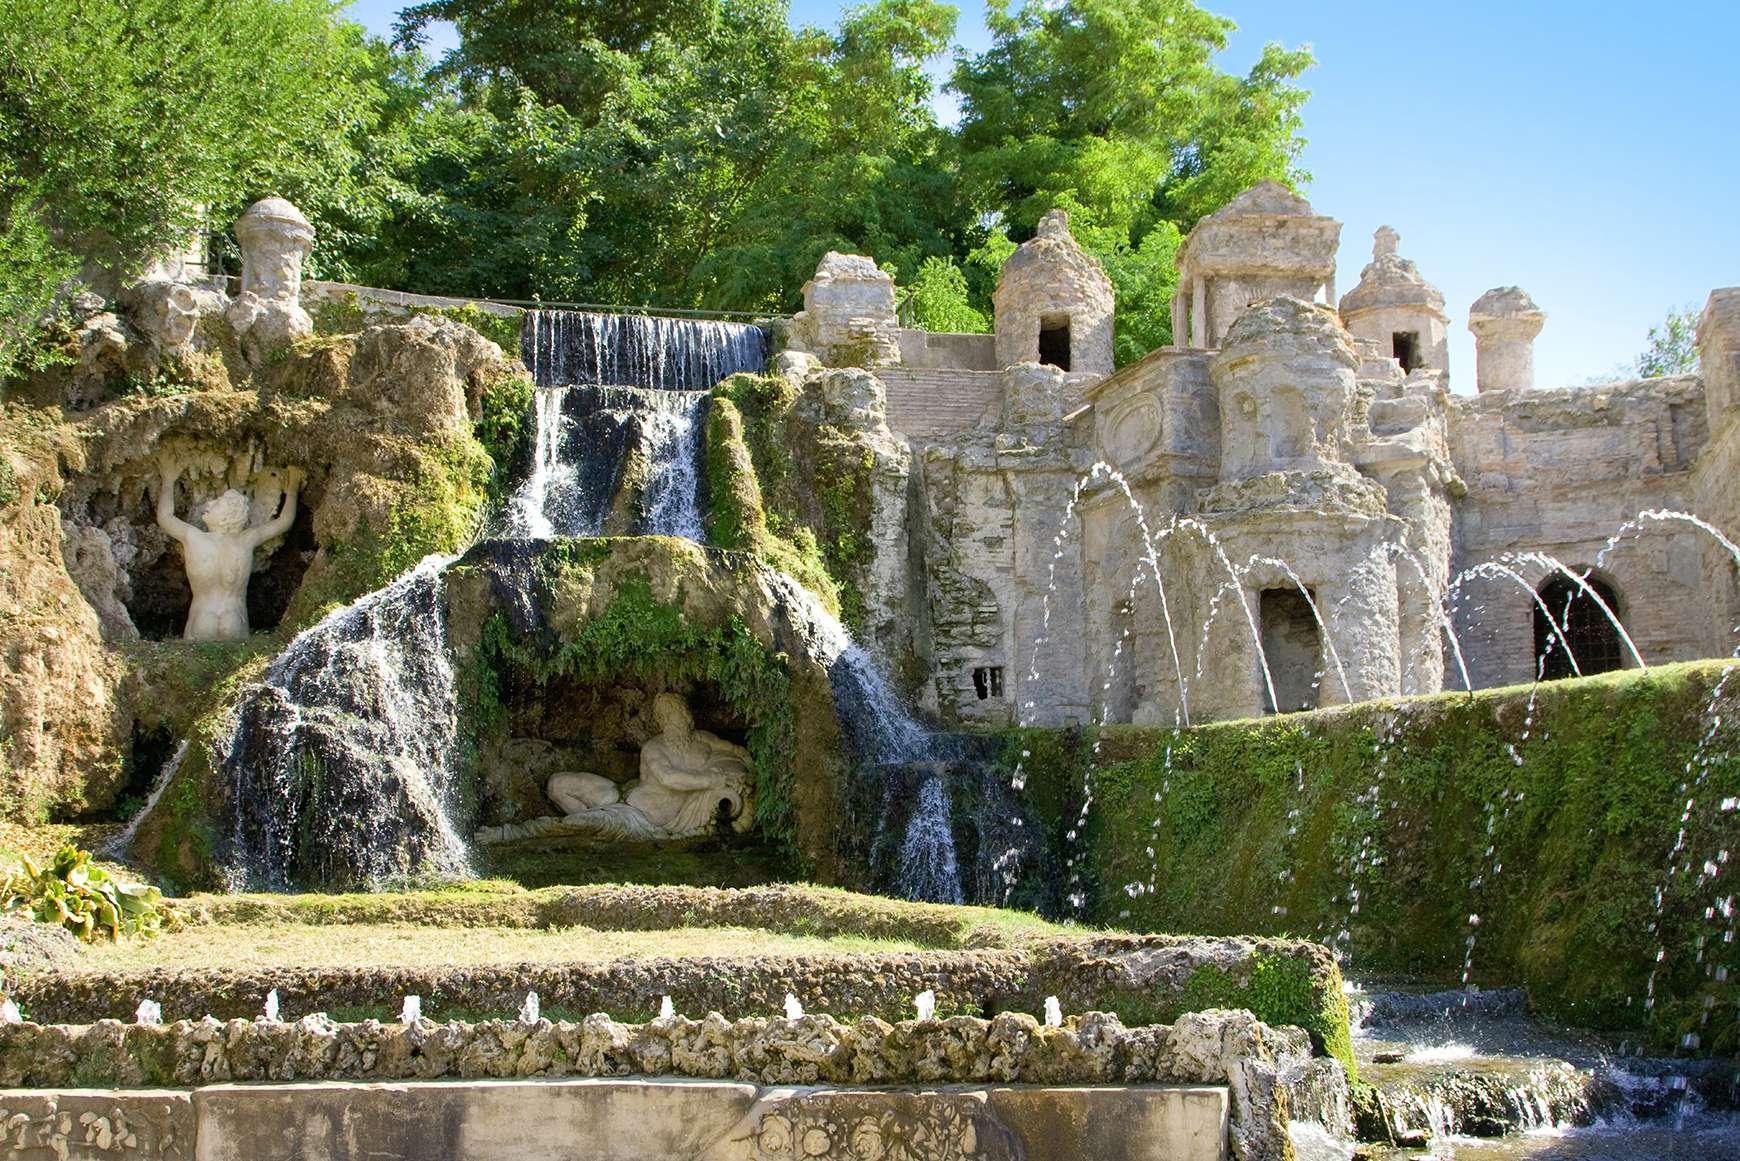 Two story fountain of Neptune at Villa d'Este in Tivoli, Italy